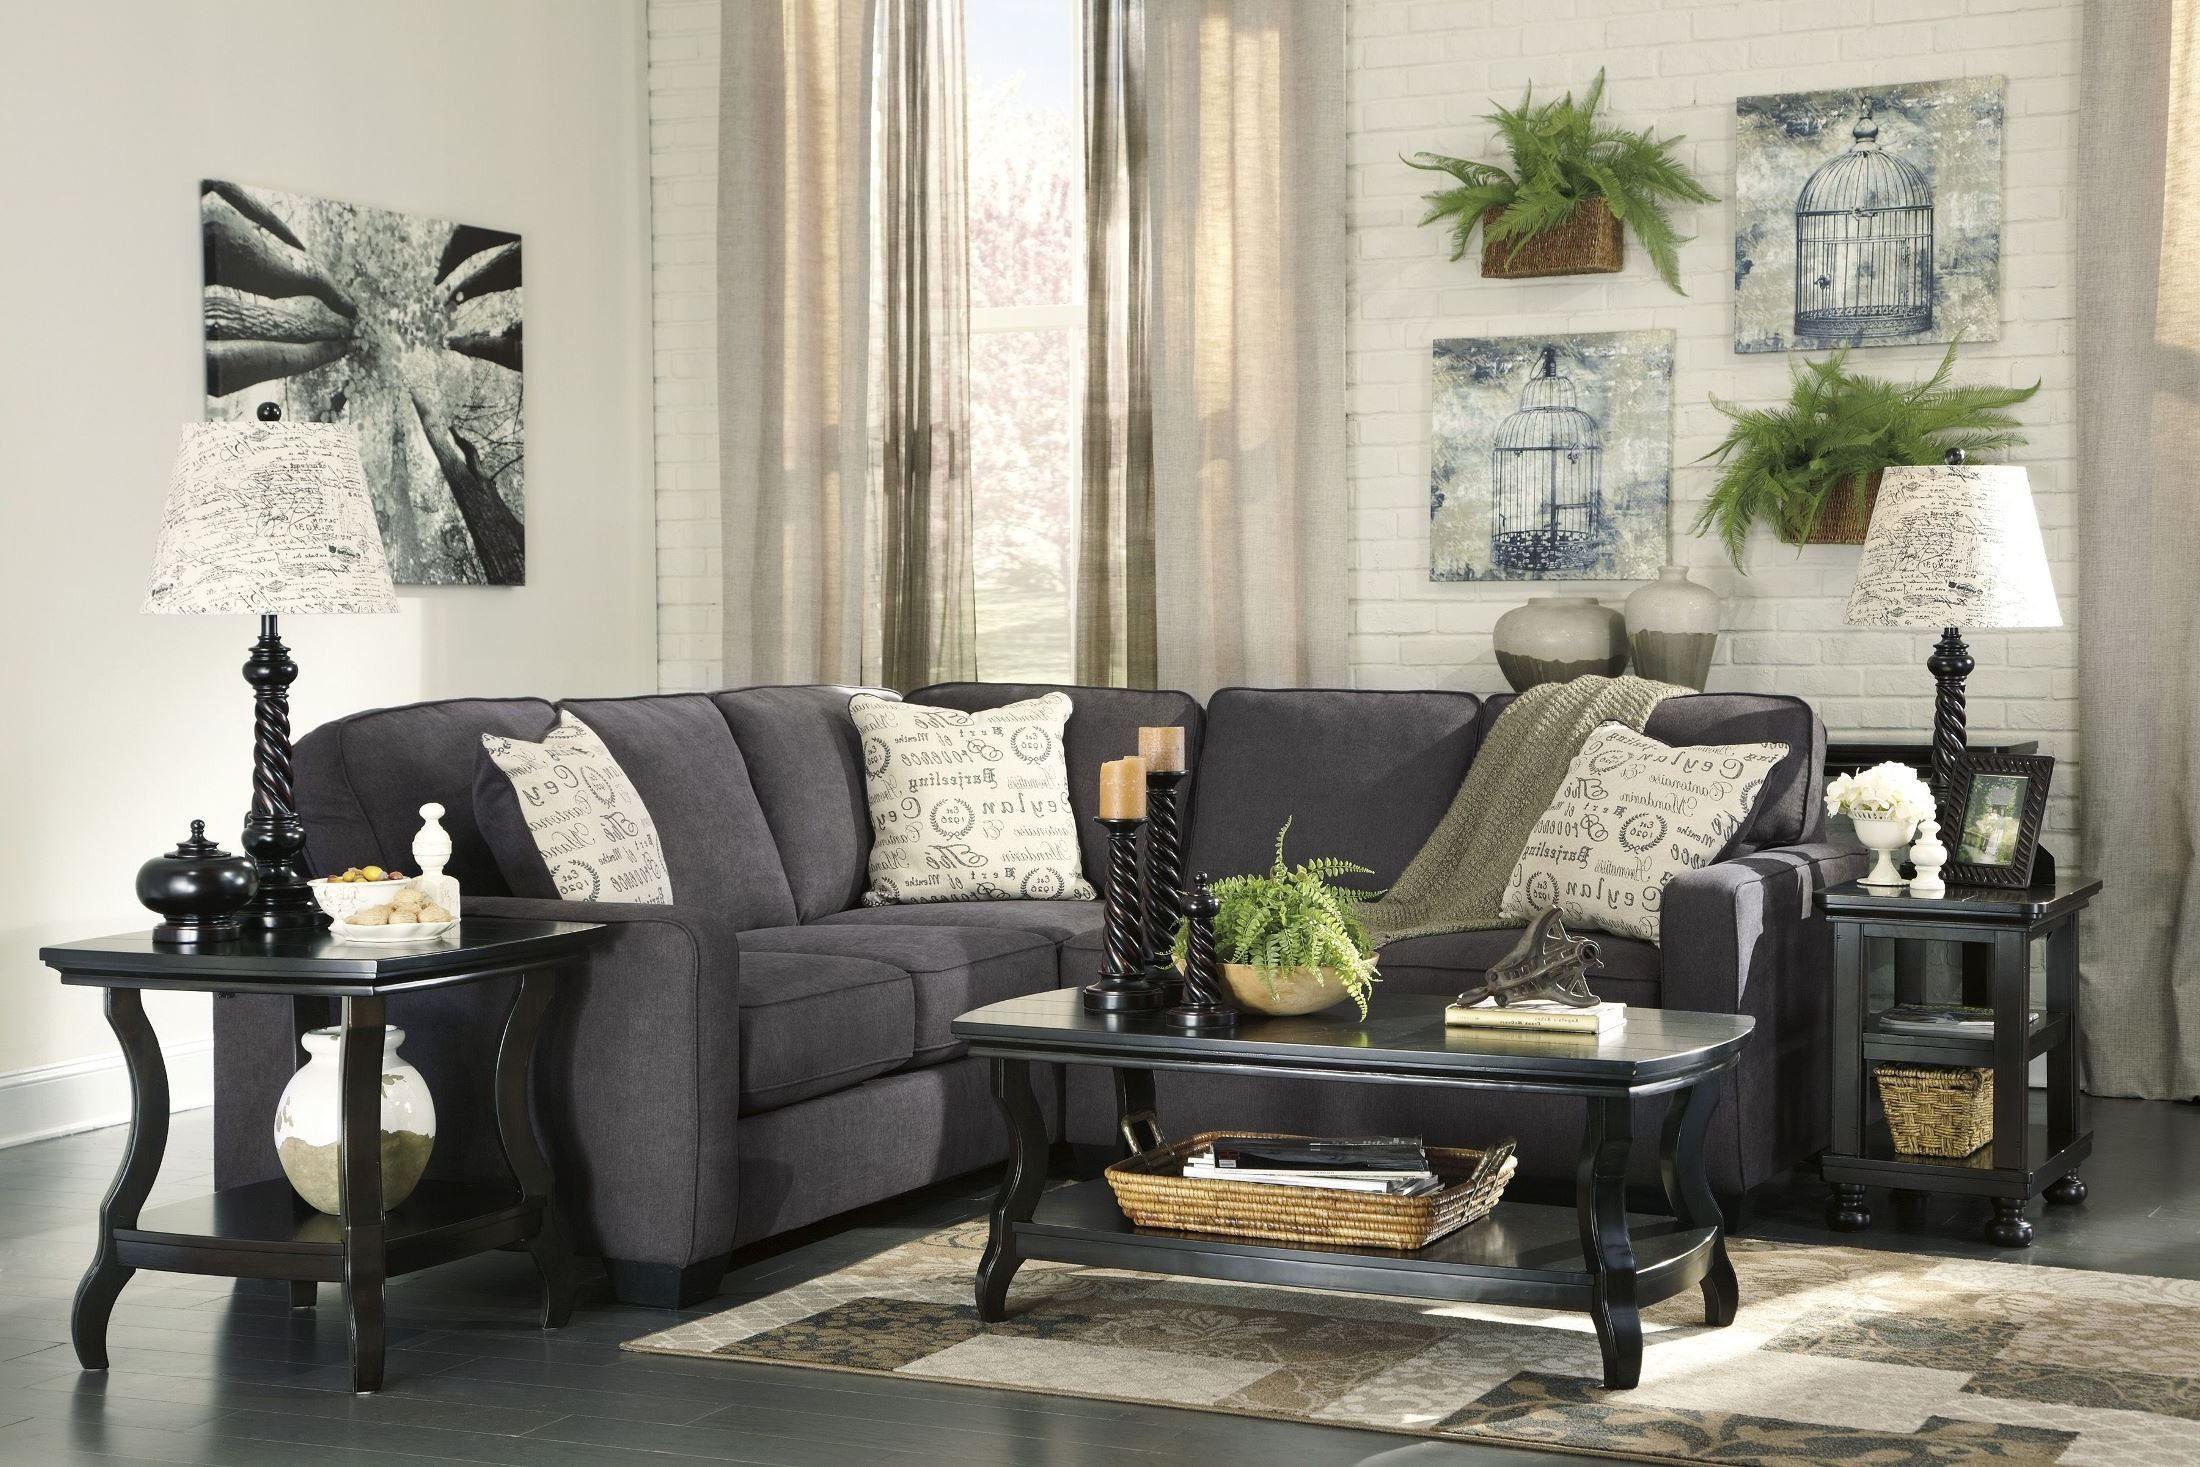 Alenya Charcoal Raf Sectional In 2021 Living Room Decor Charcoal Sectional Living Decor